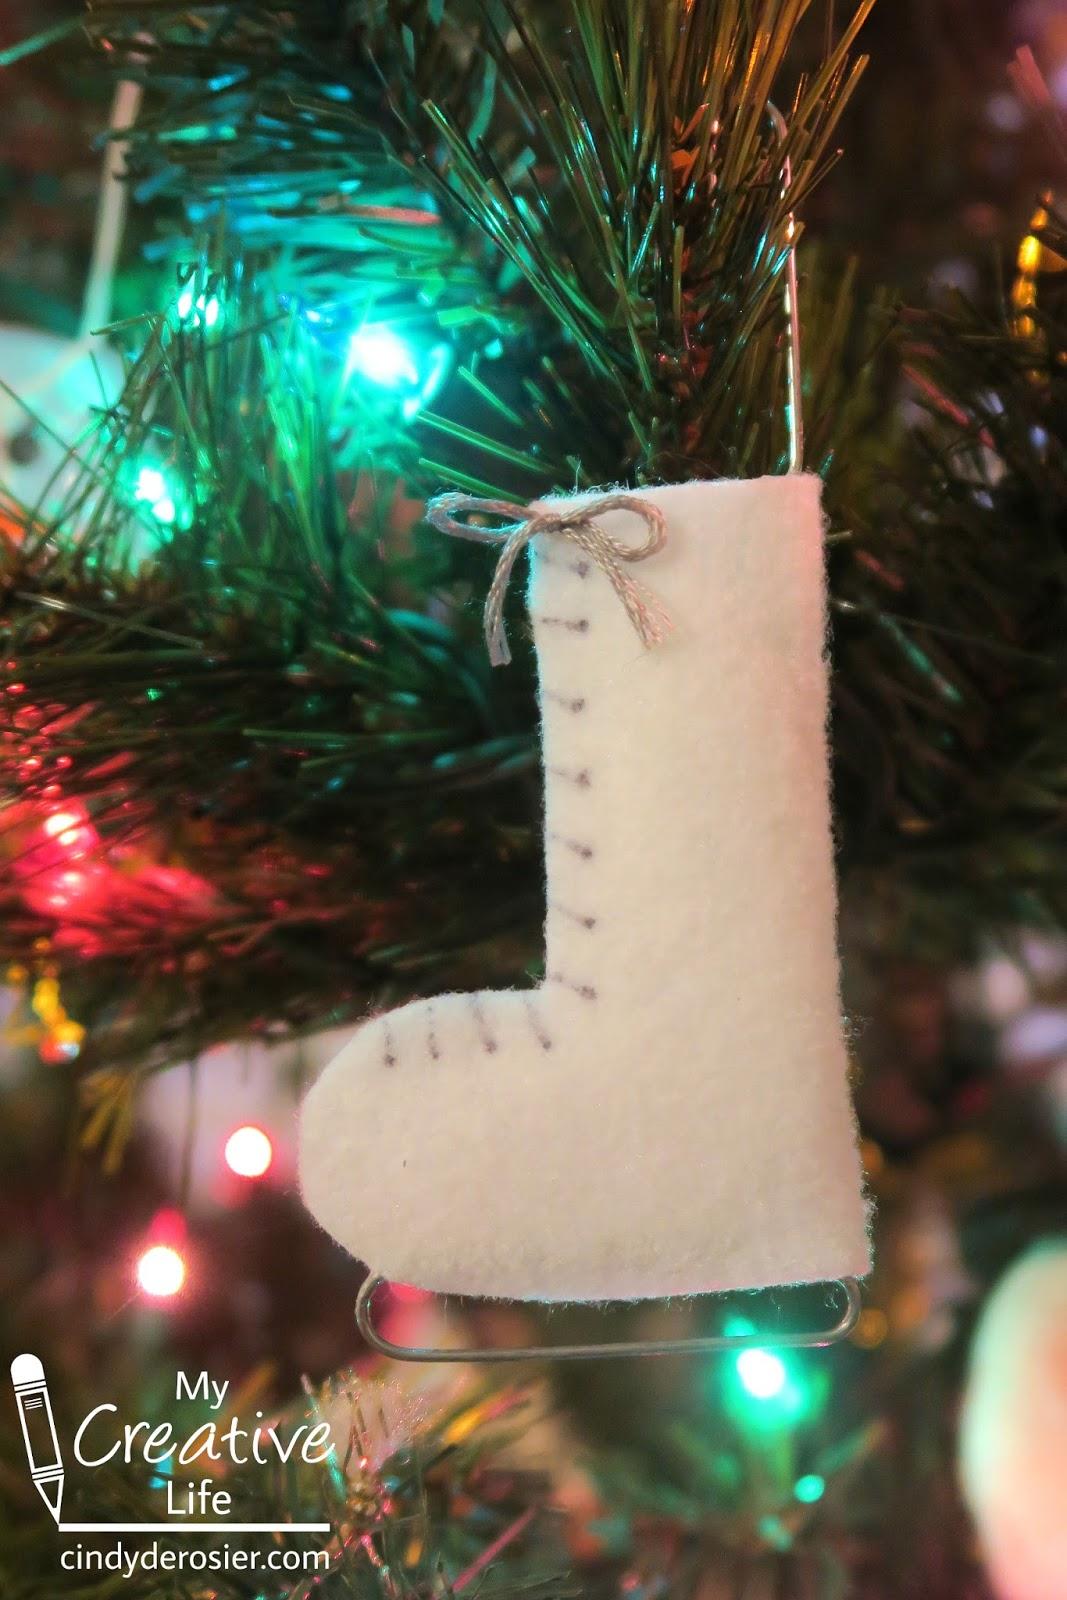 Cindy deRosier: My Creative Life: No-Sew Ice Skate Ornament